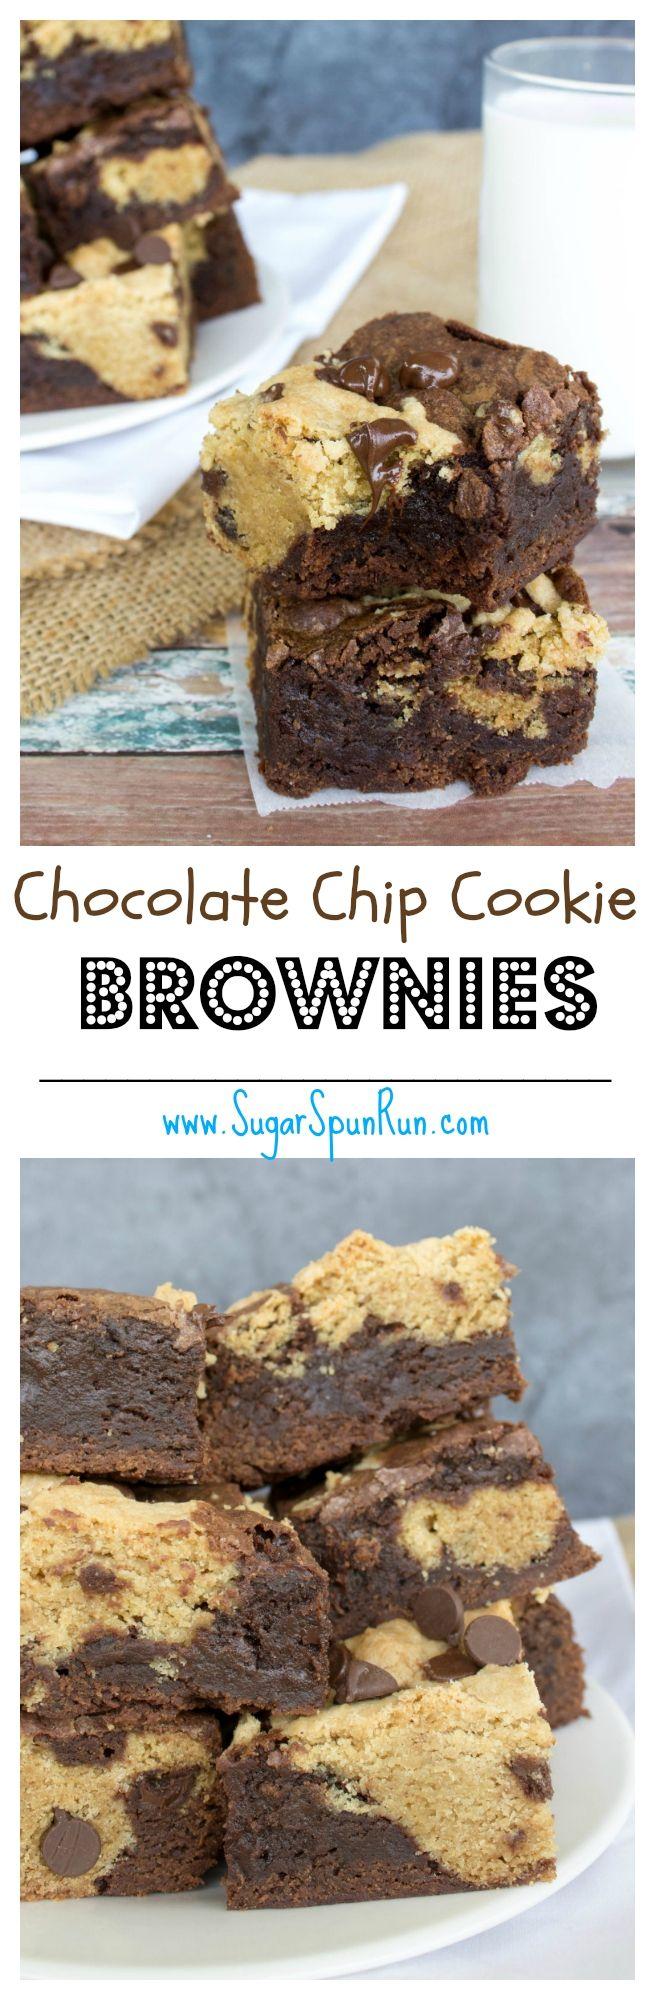 Chocolate Chip Cookie Brownies--the fudgiest best brownie recipe ever!  SugarSpunRun